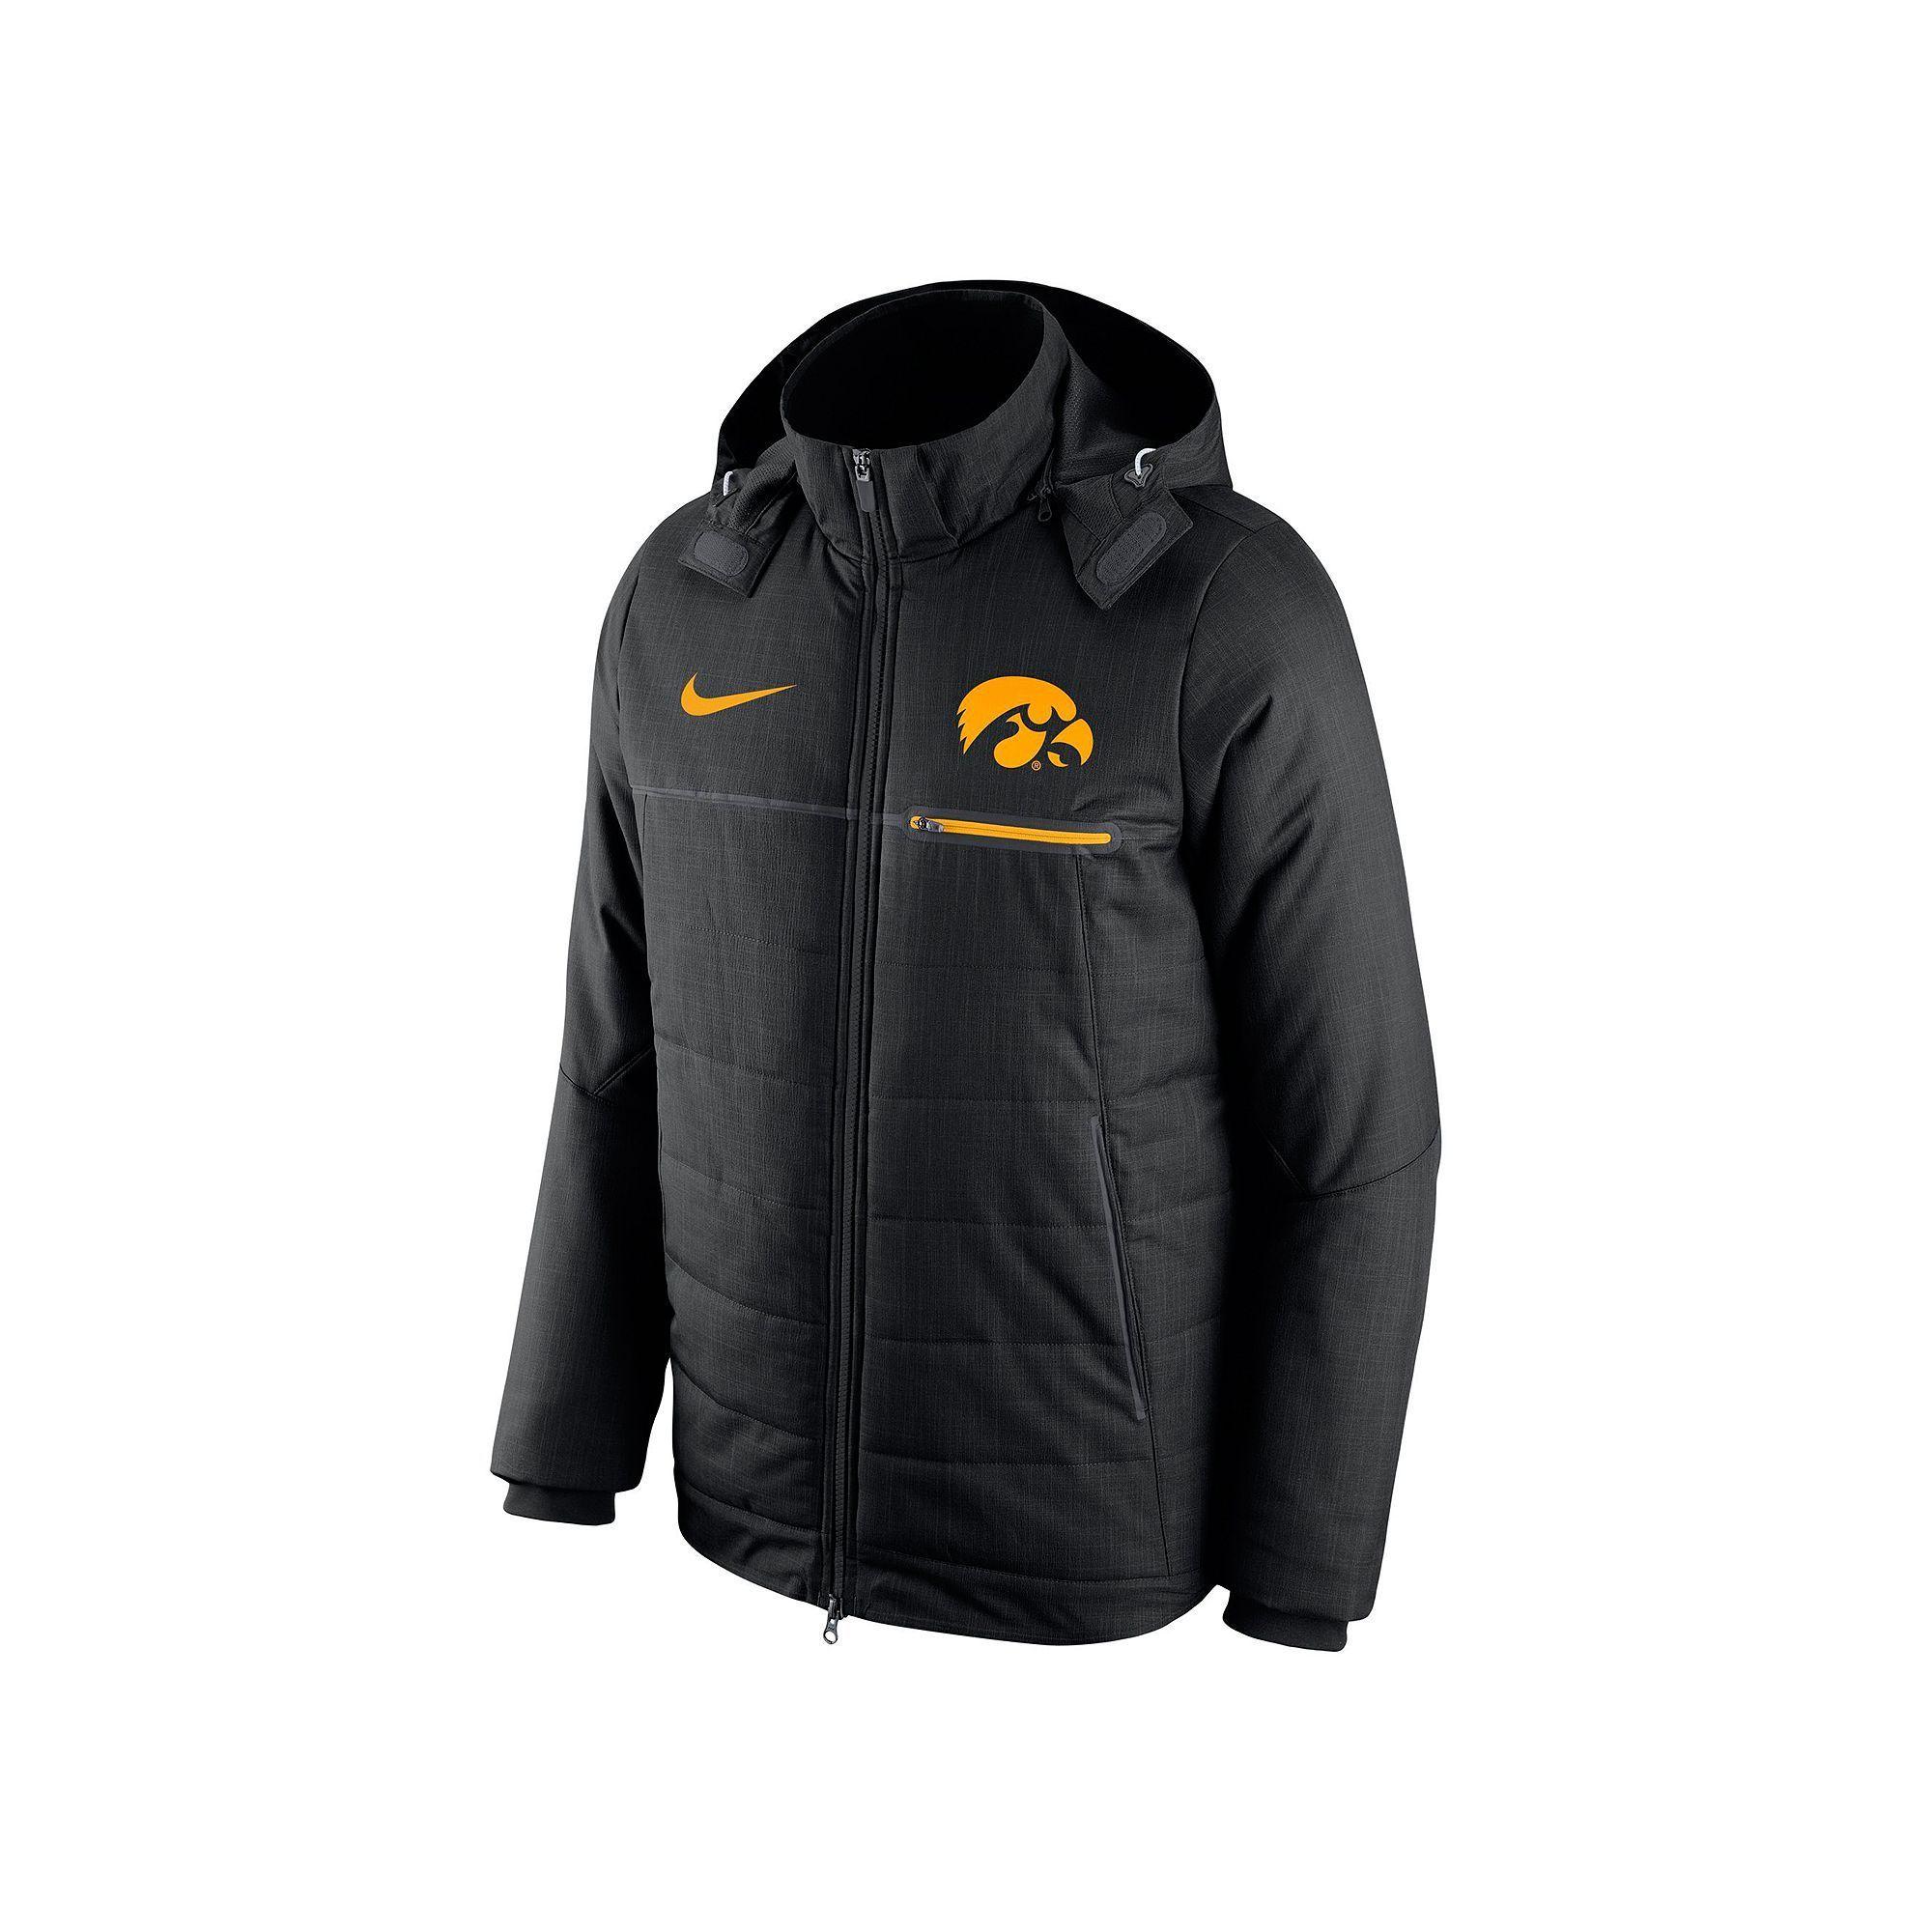 Men's Nike Iowa Hawkeyes Sideline Jacket   Products   Nike